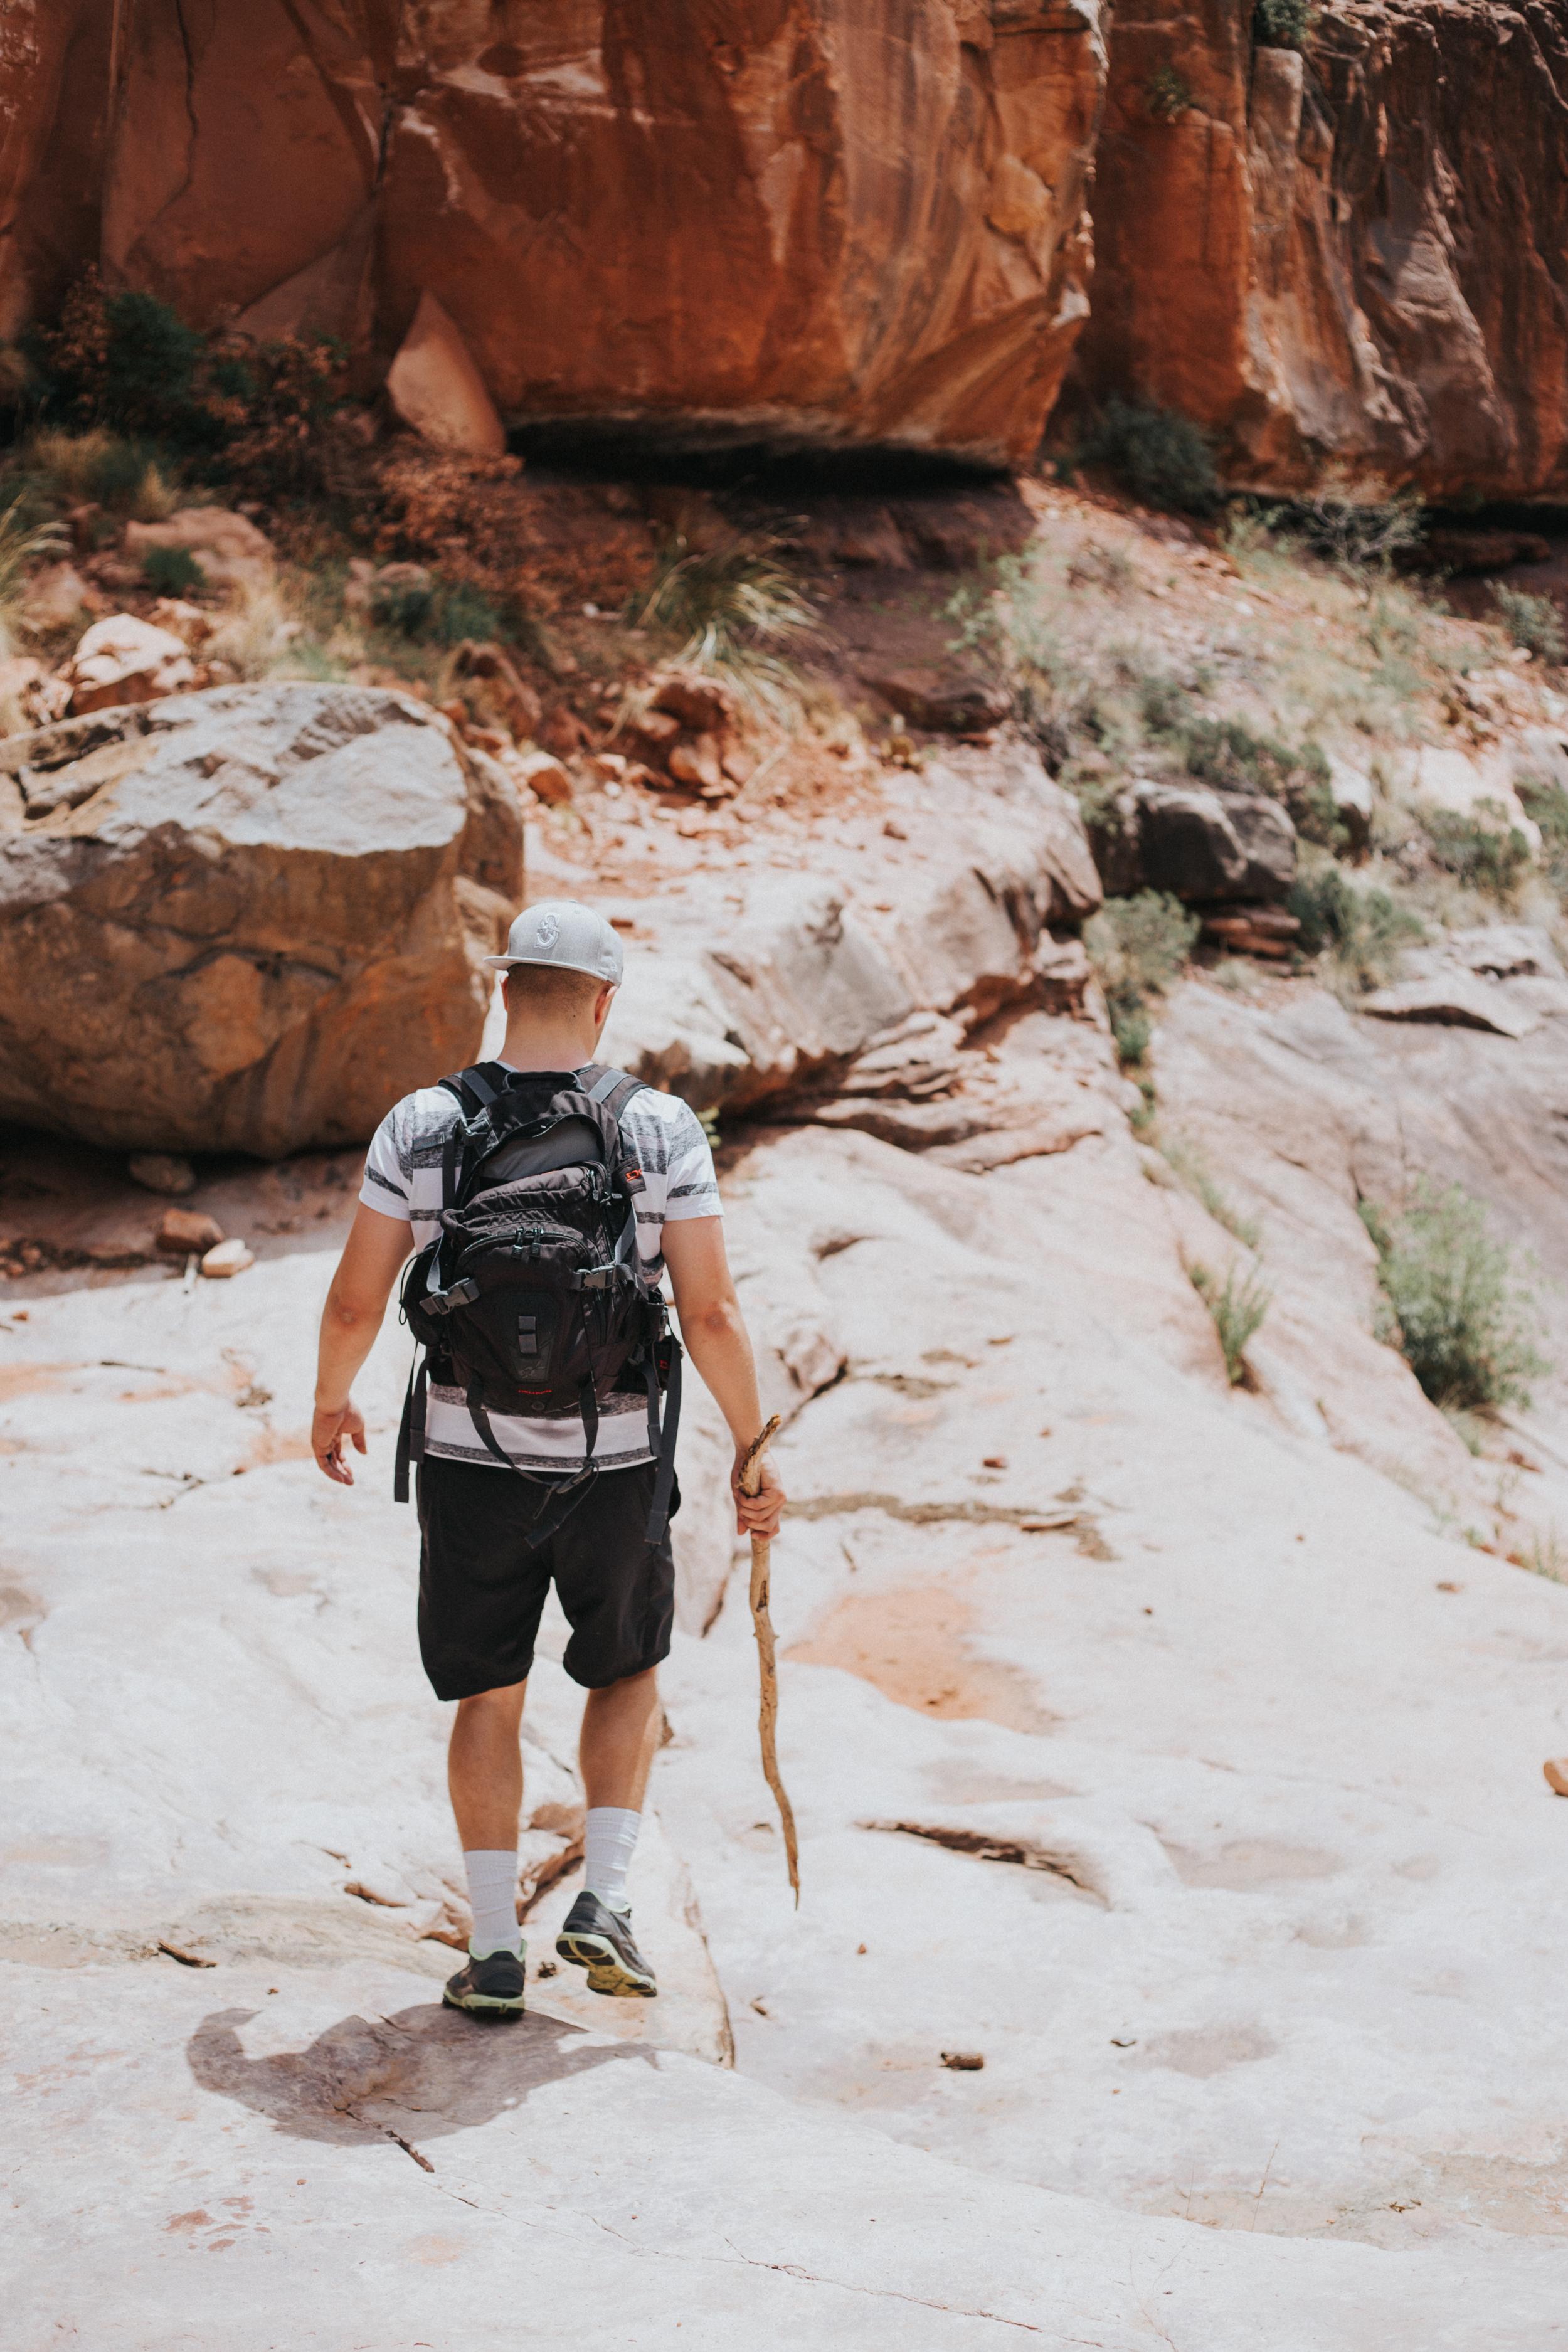 Sedona - AZ - Arizona - Hiking - Oak Creek Canyon - Adventure - Las Vegas Photographer - Photographer - Photography - Kamra Fuller Photography - Arizona Photography - Sedona Photography - Travel Photography - Travel Photographer - Travel - River - National Park